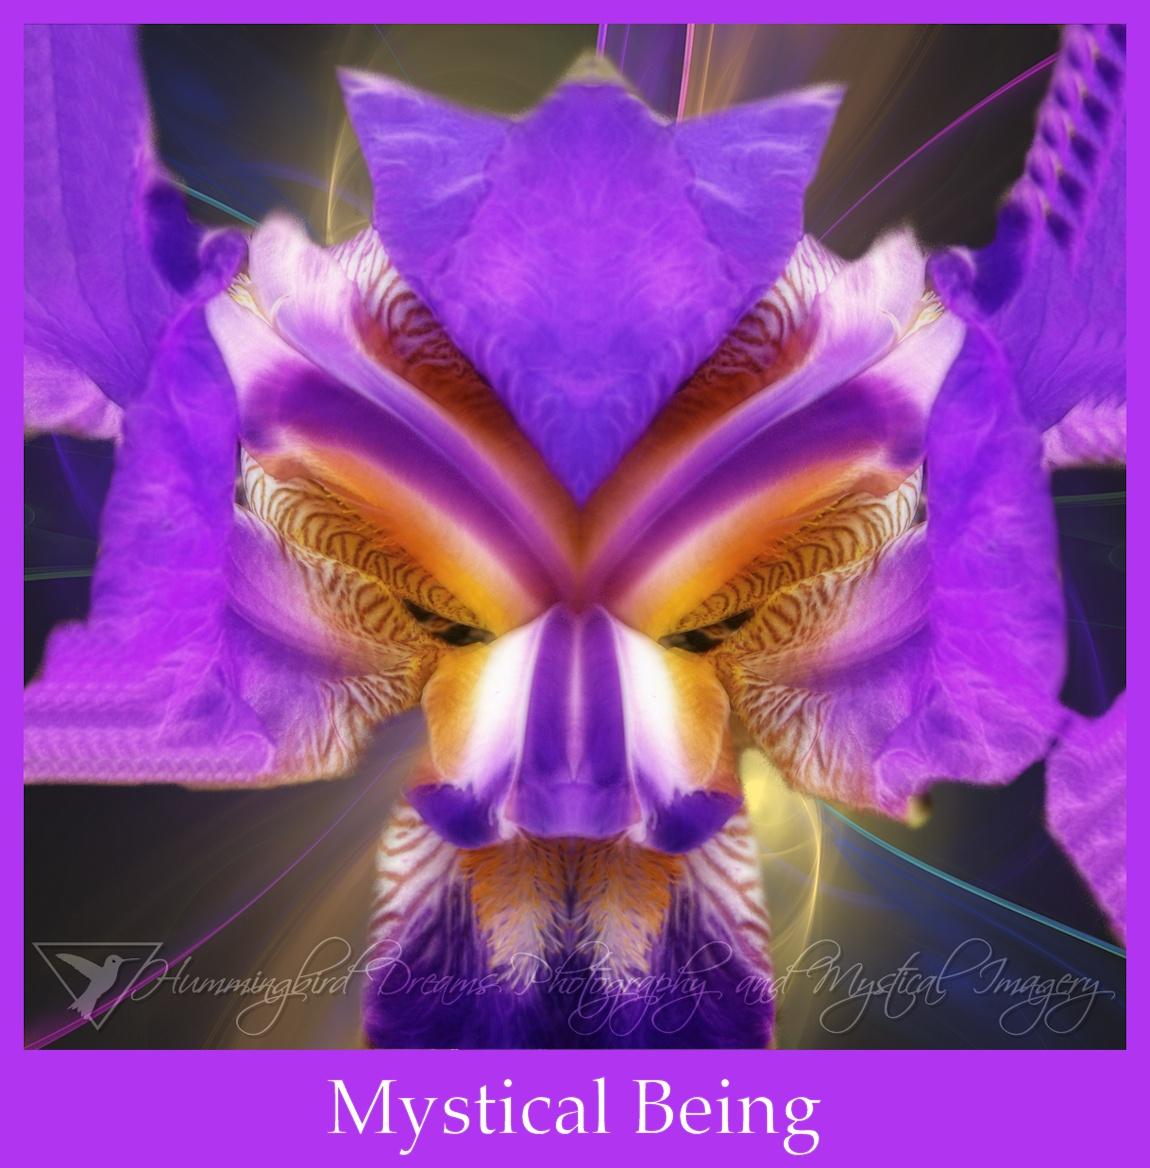 Mystical Being